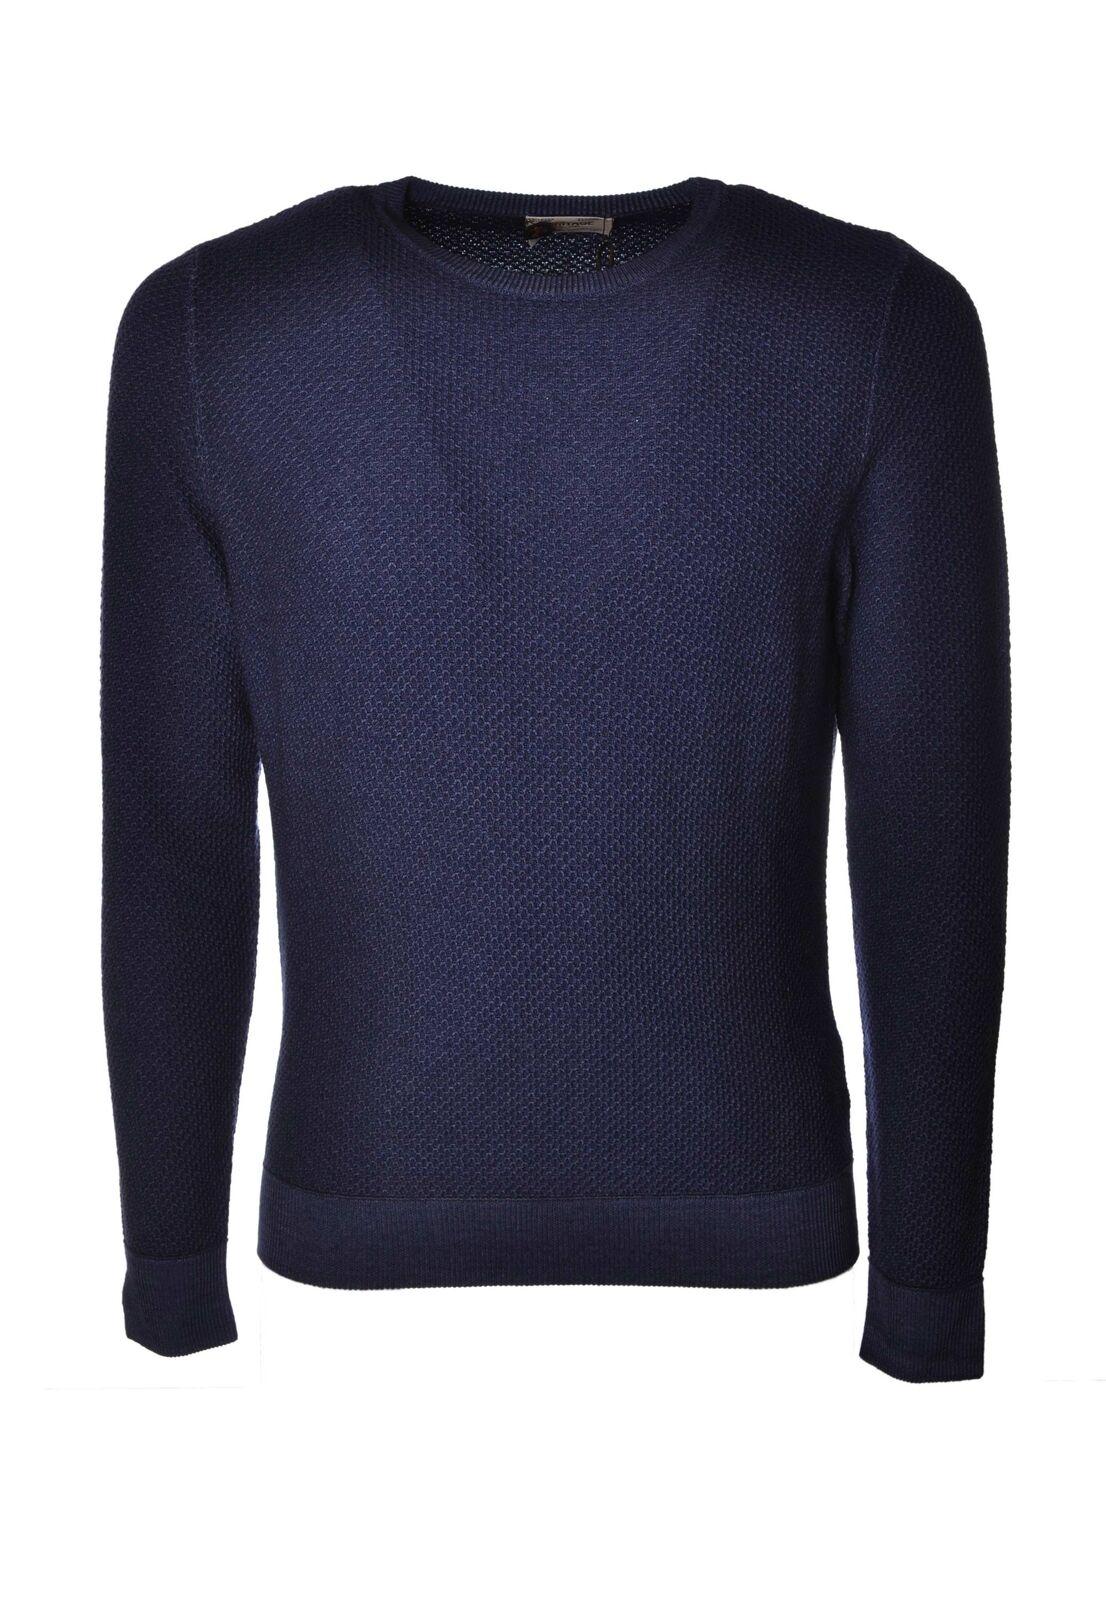 Heritage  -  schweißers - Male - Blau - 4063818A183001